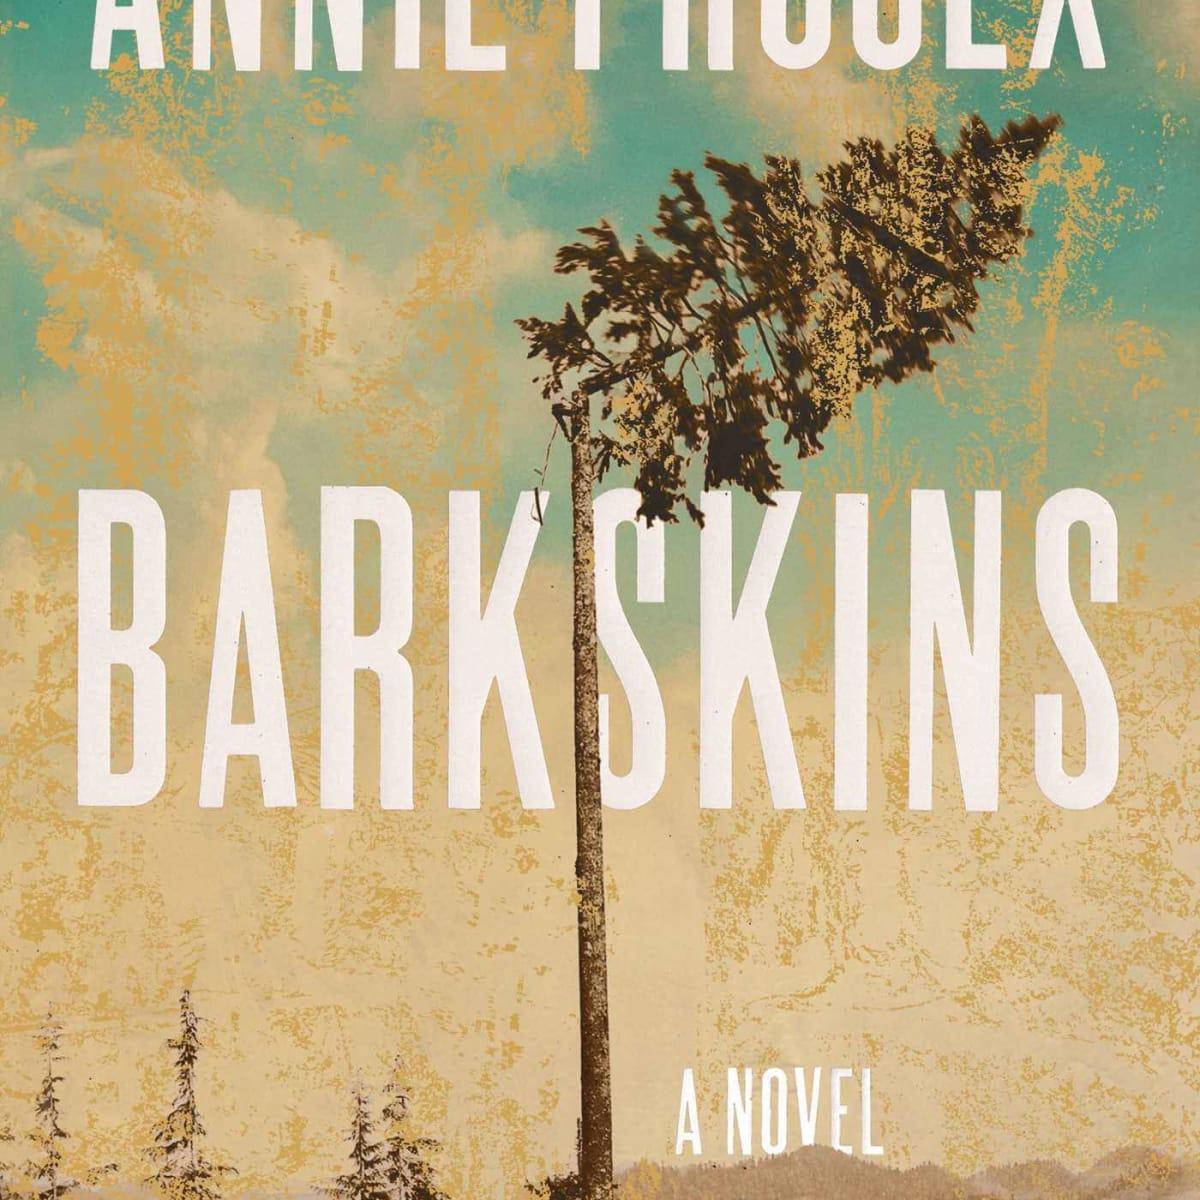 Inprint: Annie Proulx reading, Barkskins